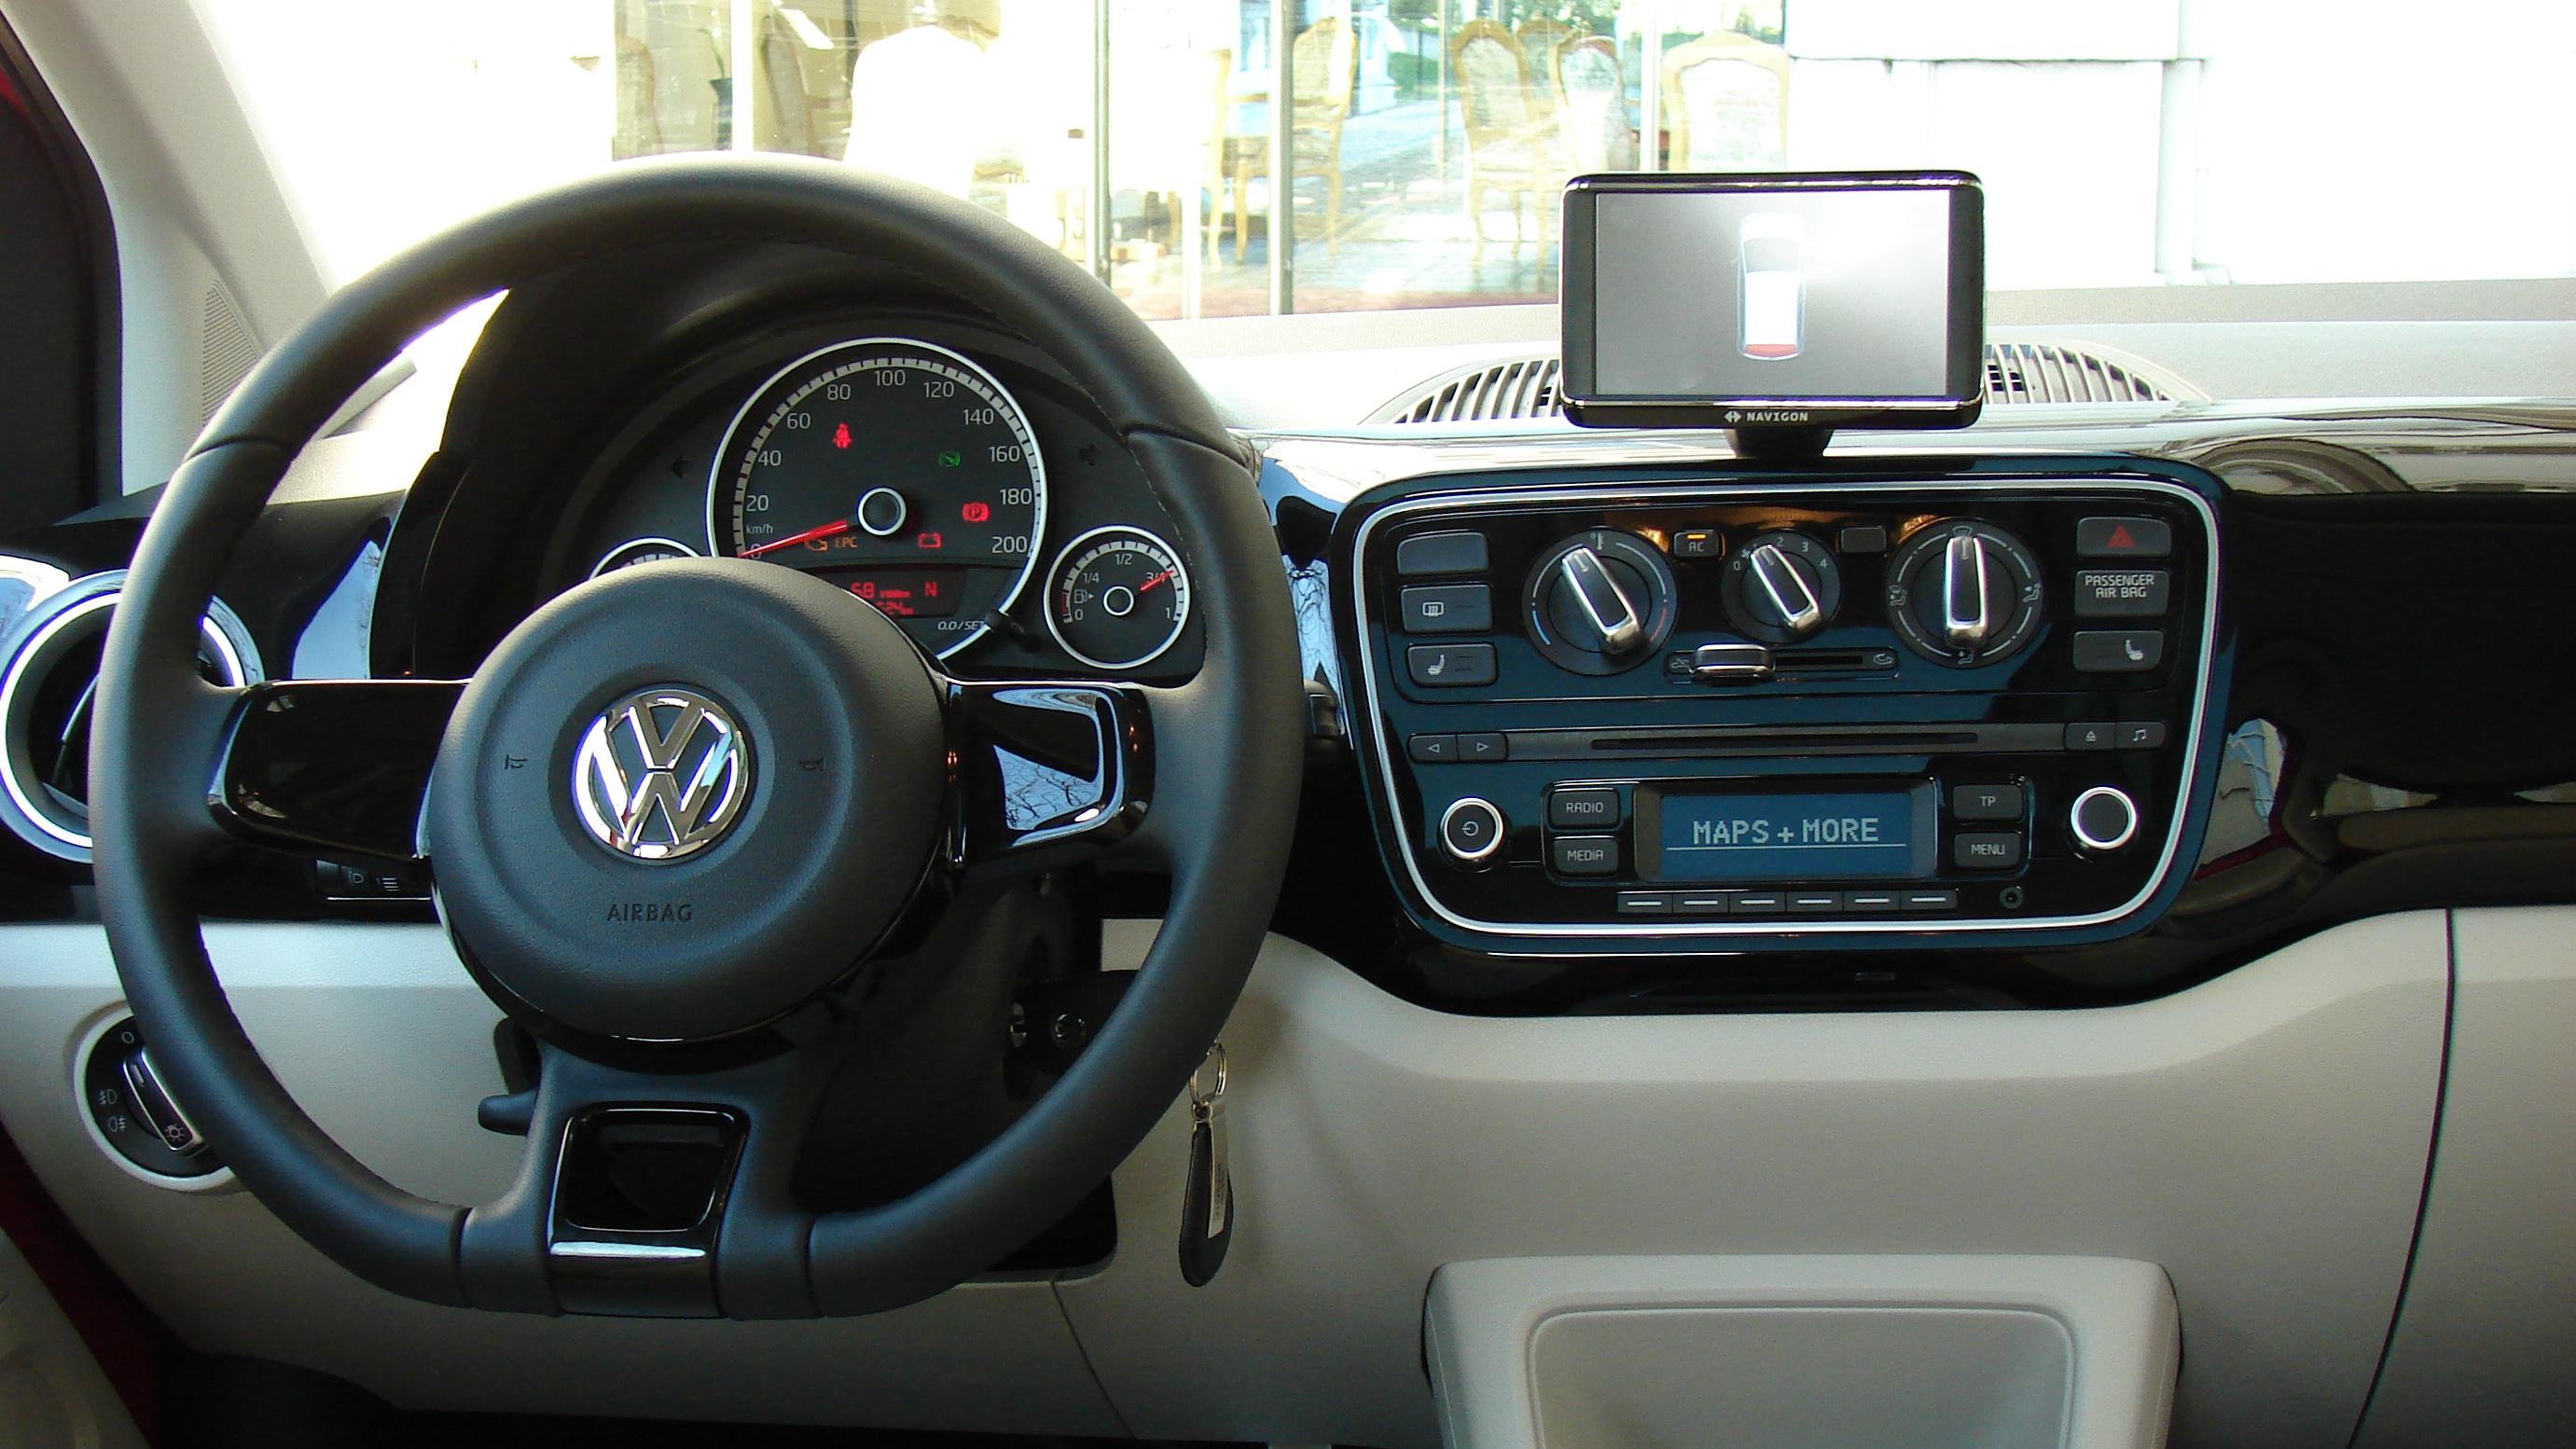 essai volkswagen up 5 portes bva automatiquement meilleure. Black Bedroom Furniture Sets. Home Design Ideas